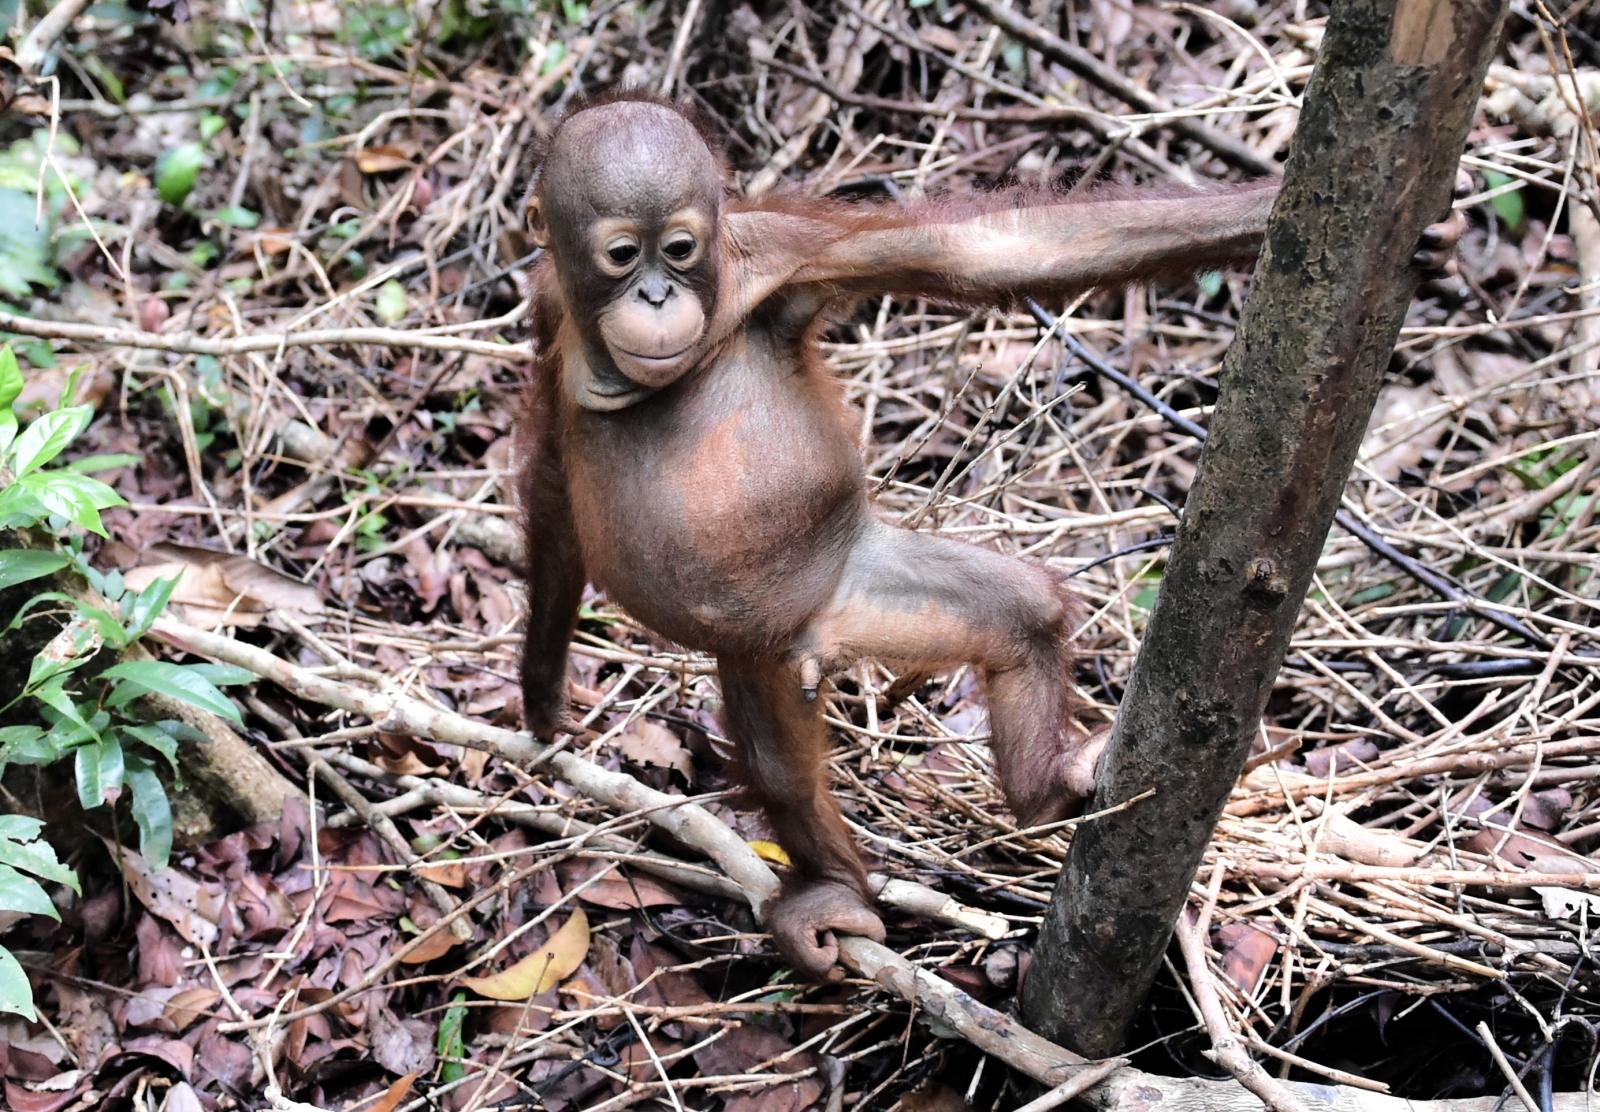 borneo deforestation orangutan